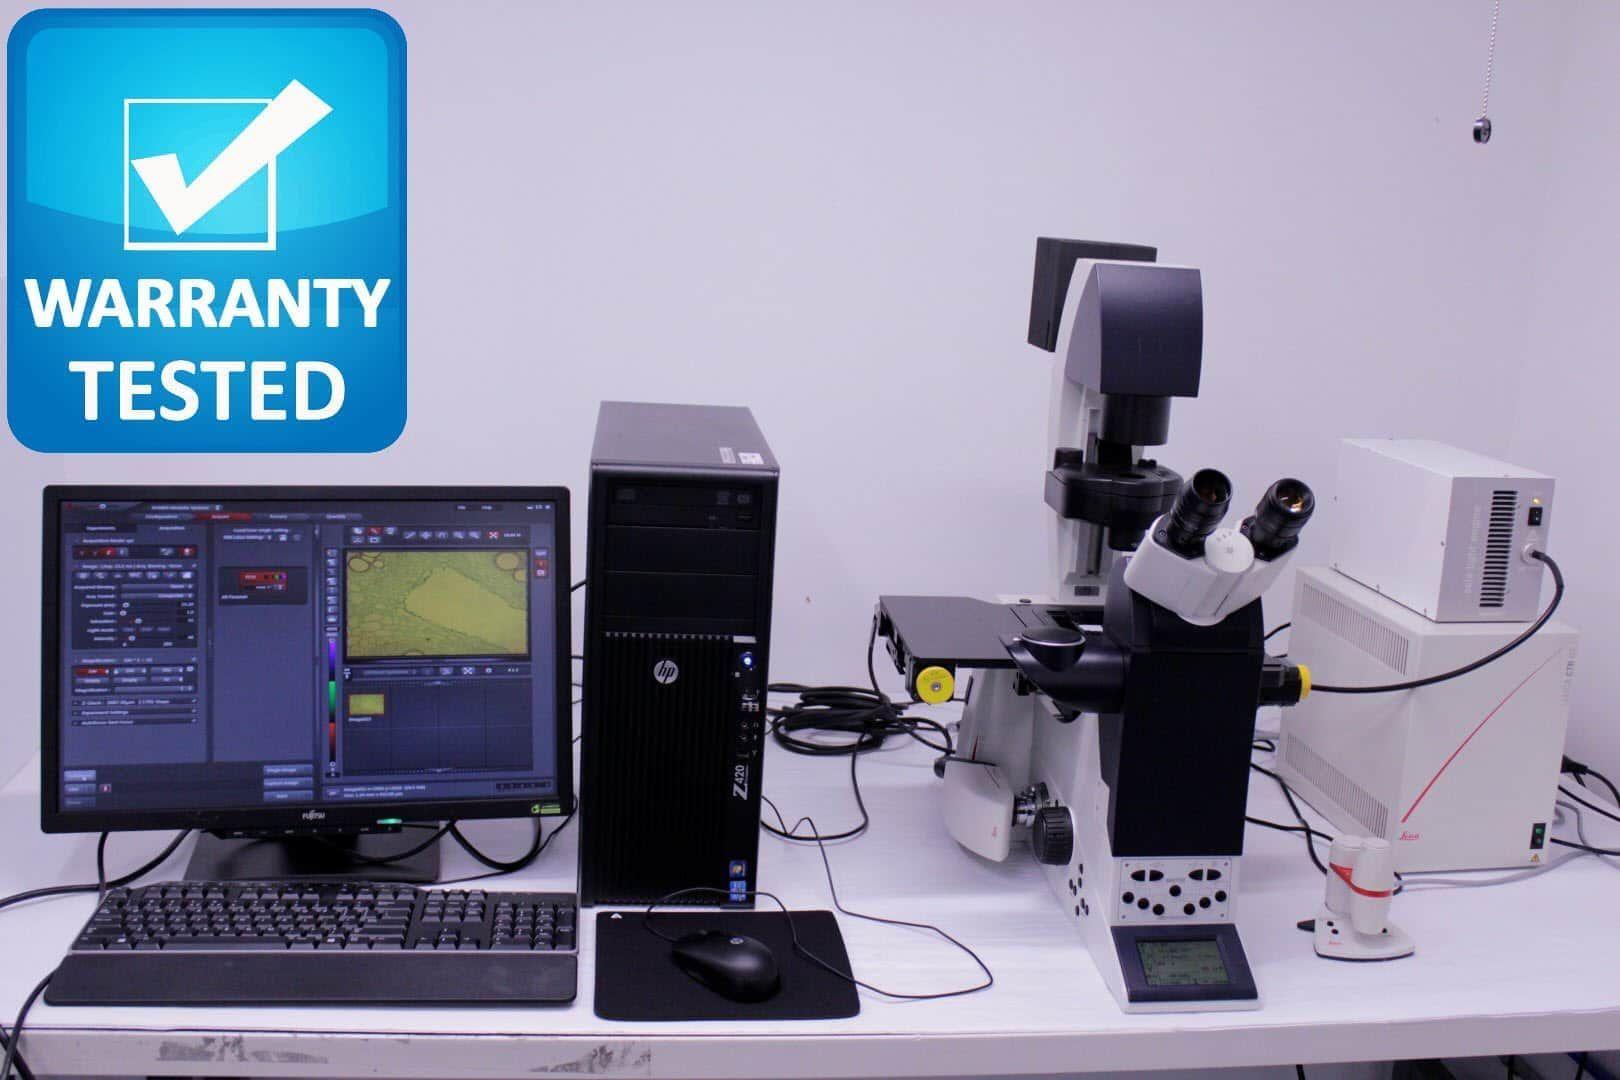 Leica DMI6000 B Inverted Motorized Fluorescence Autofocus Microscope